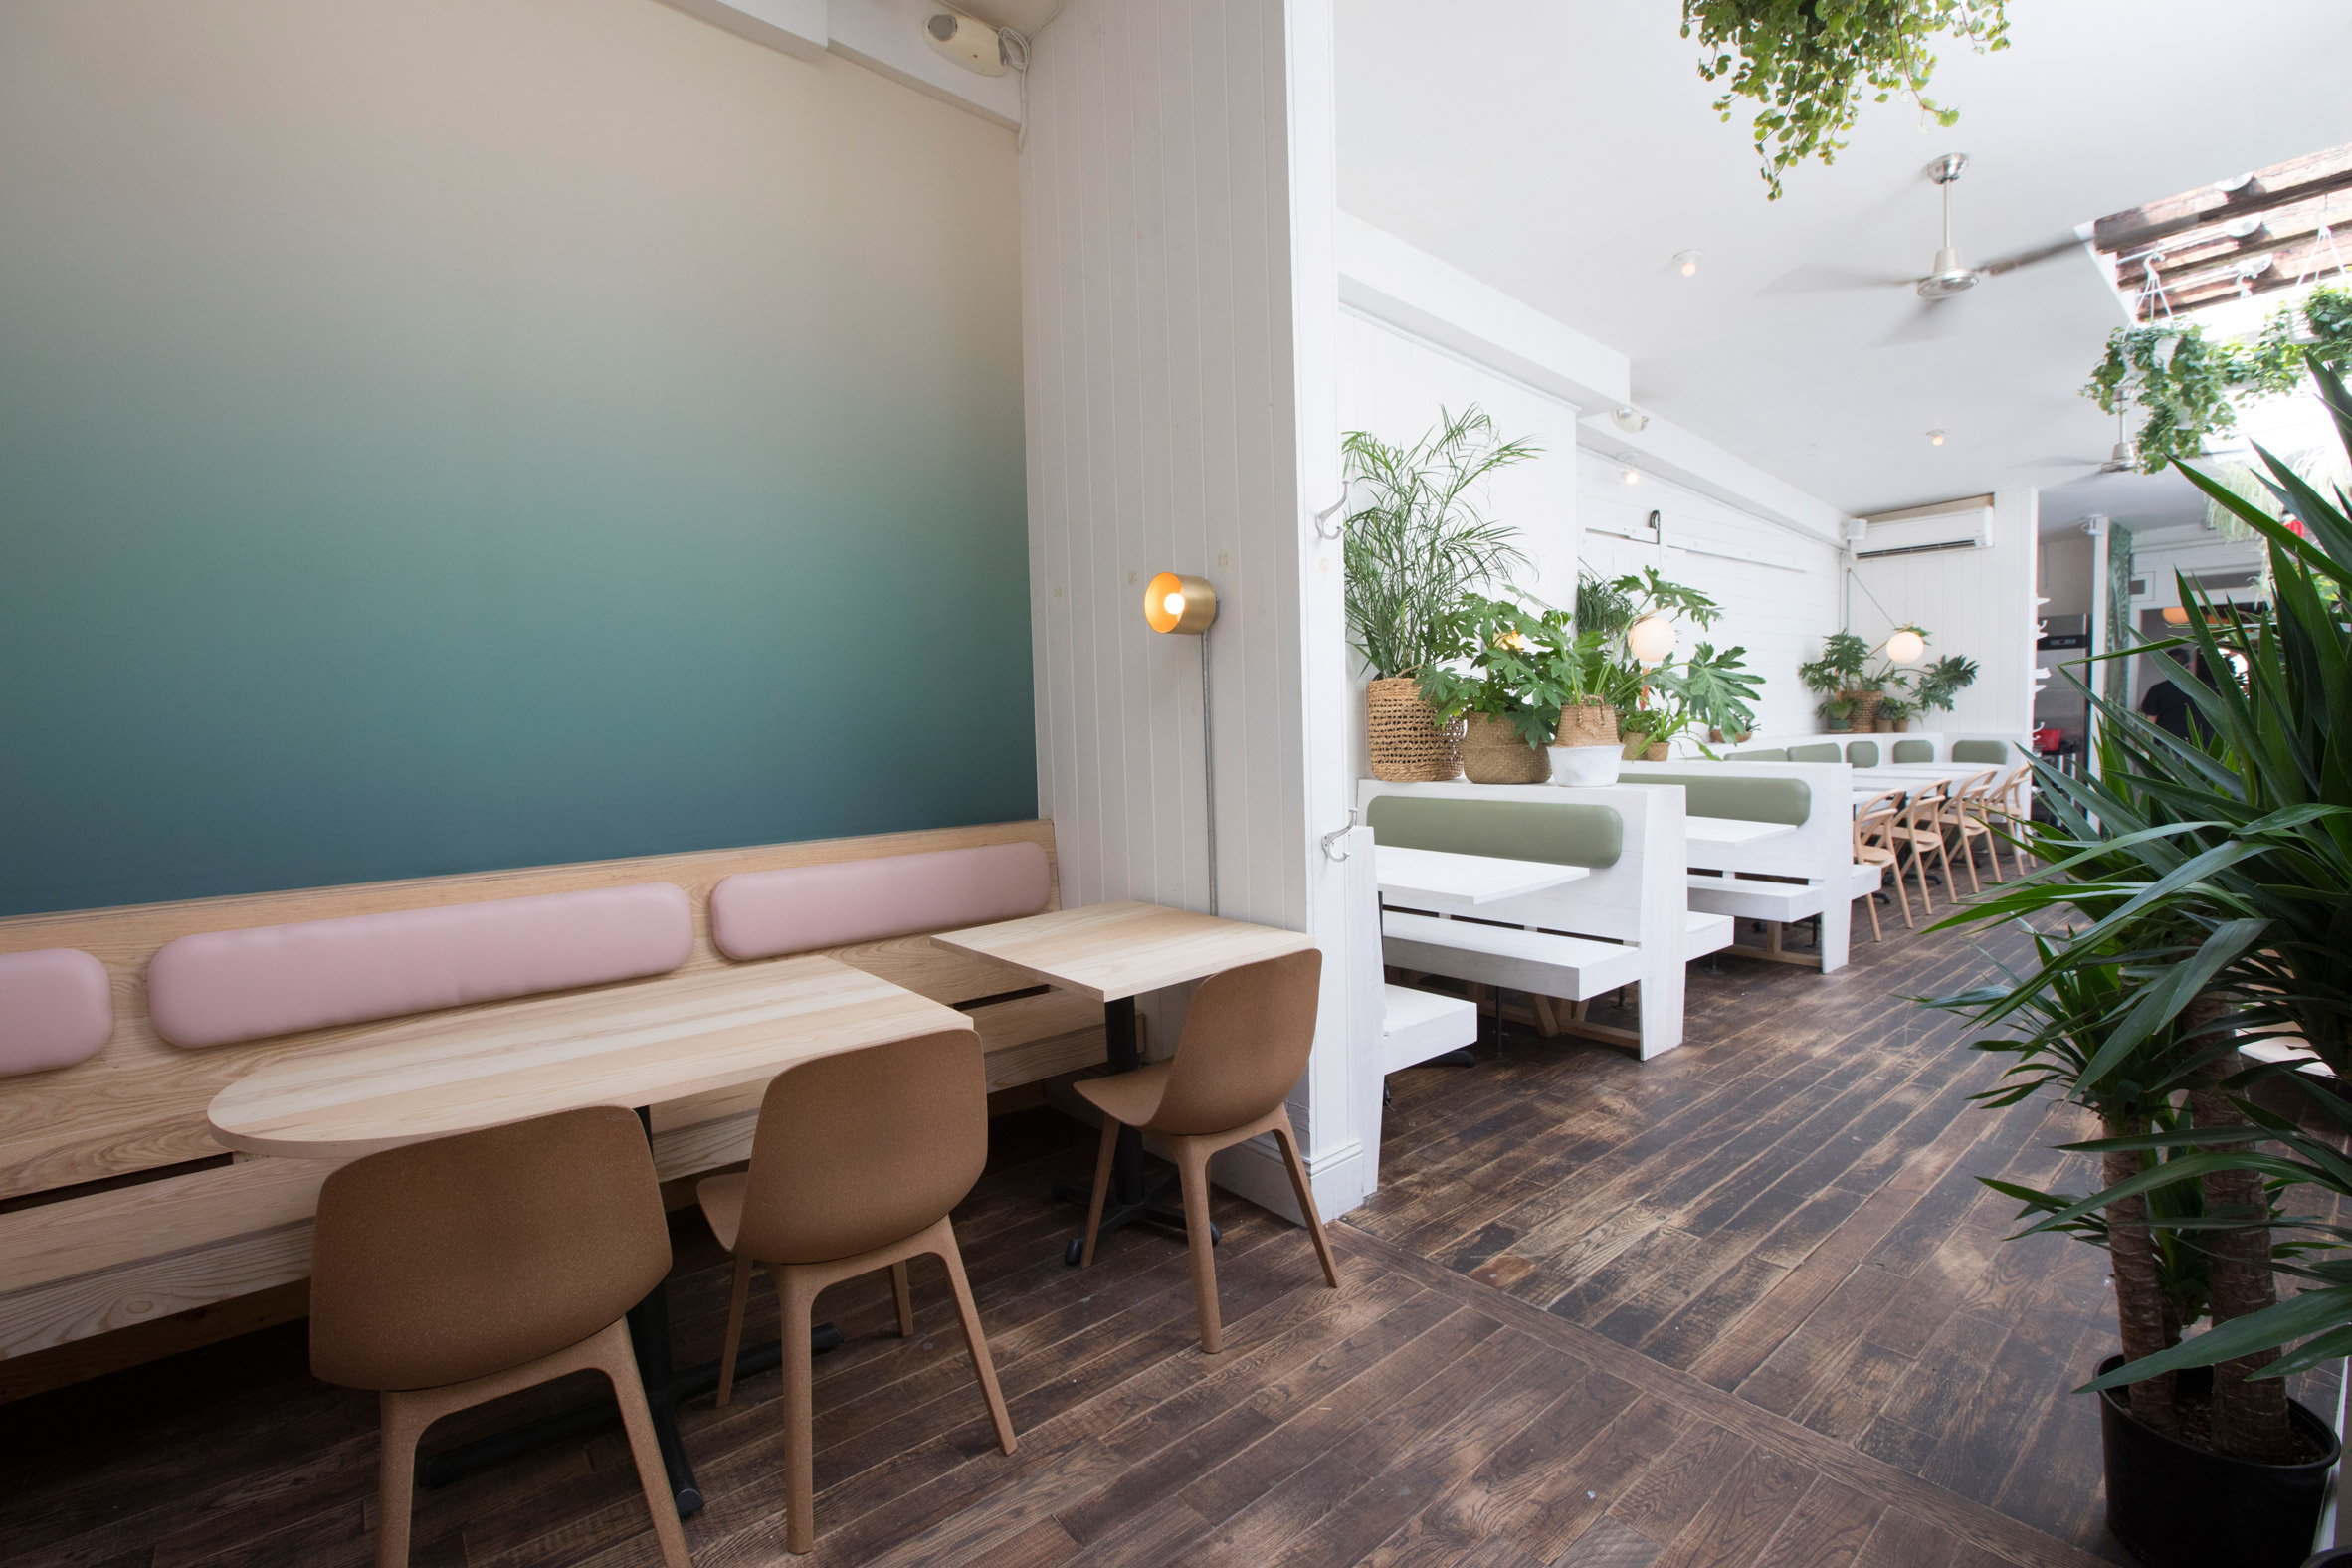 di-an-di-huy-bui-interiors-restaurant-brooklyn-new-york-usa_dezeen_2364_col_3.jpg